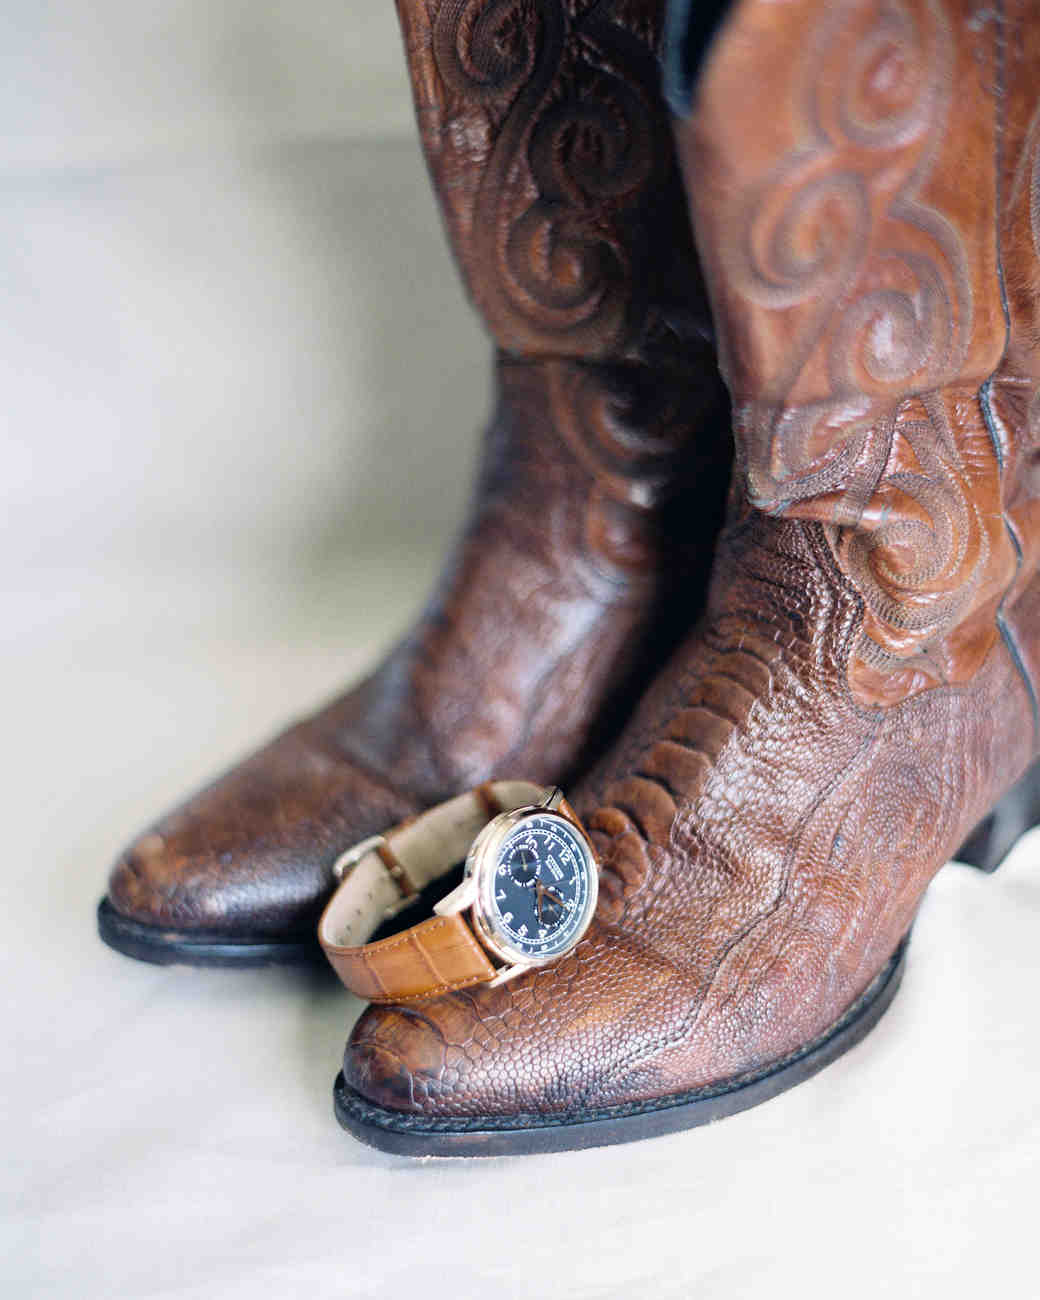 mackenzie-ian-wedding-boots-027-s112461-0116.jpg